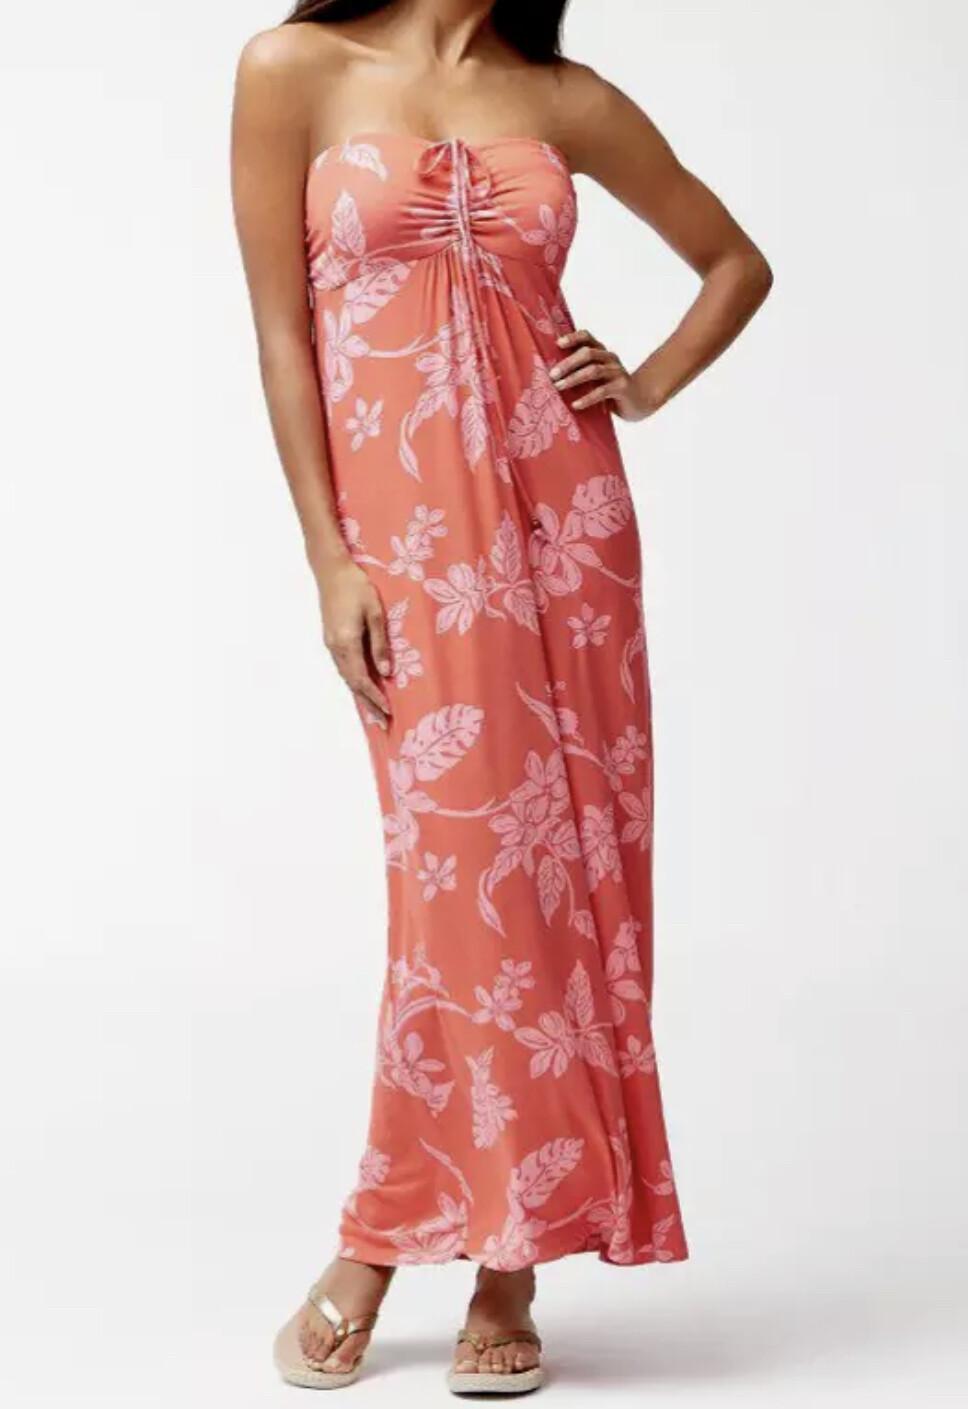 New TOMMY BAHAMA Hibiscus Hiatus Maxi Dress Medium $165